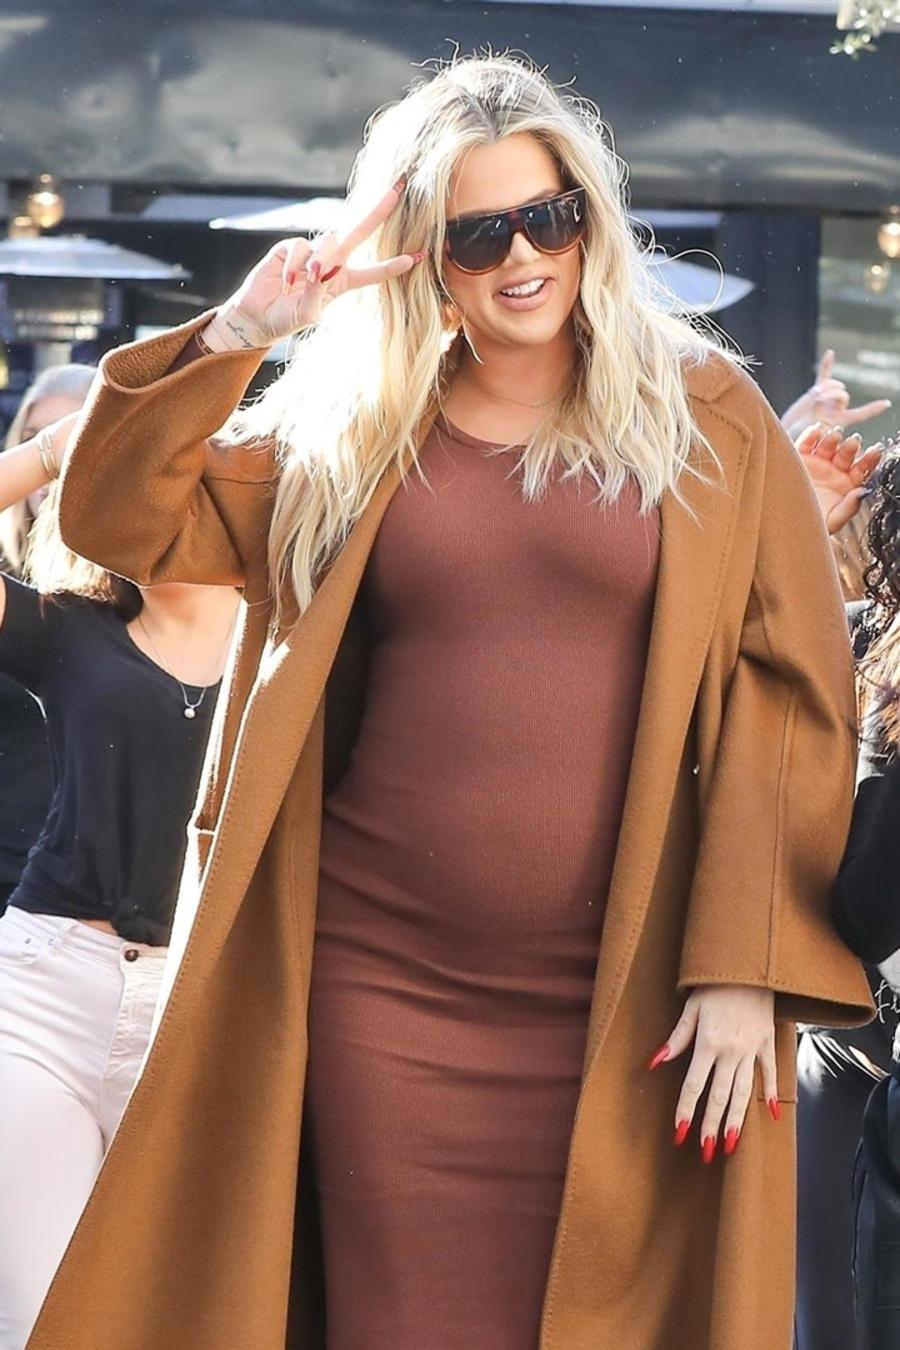 Khloé Kardashian bailando